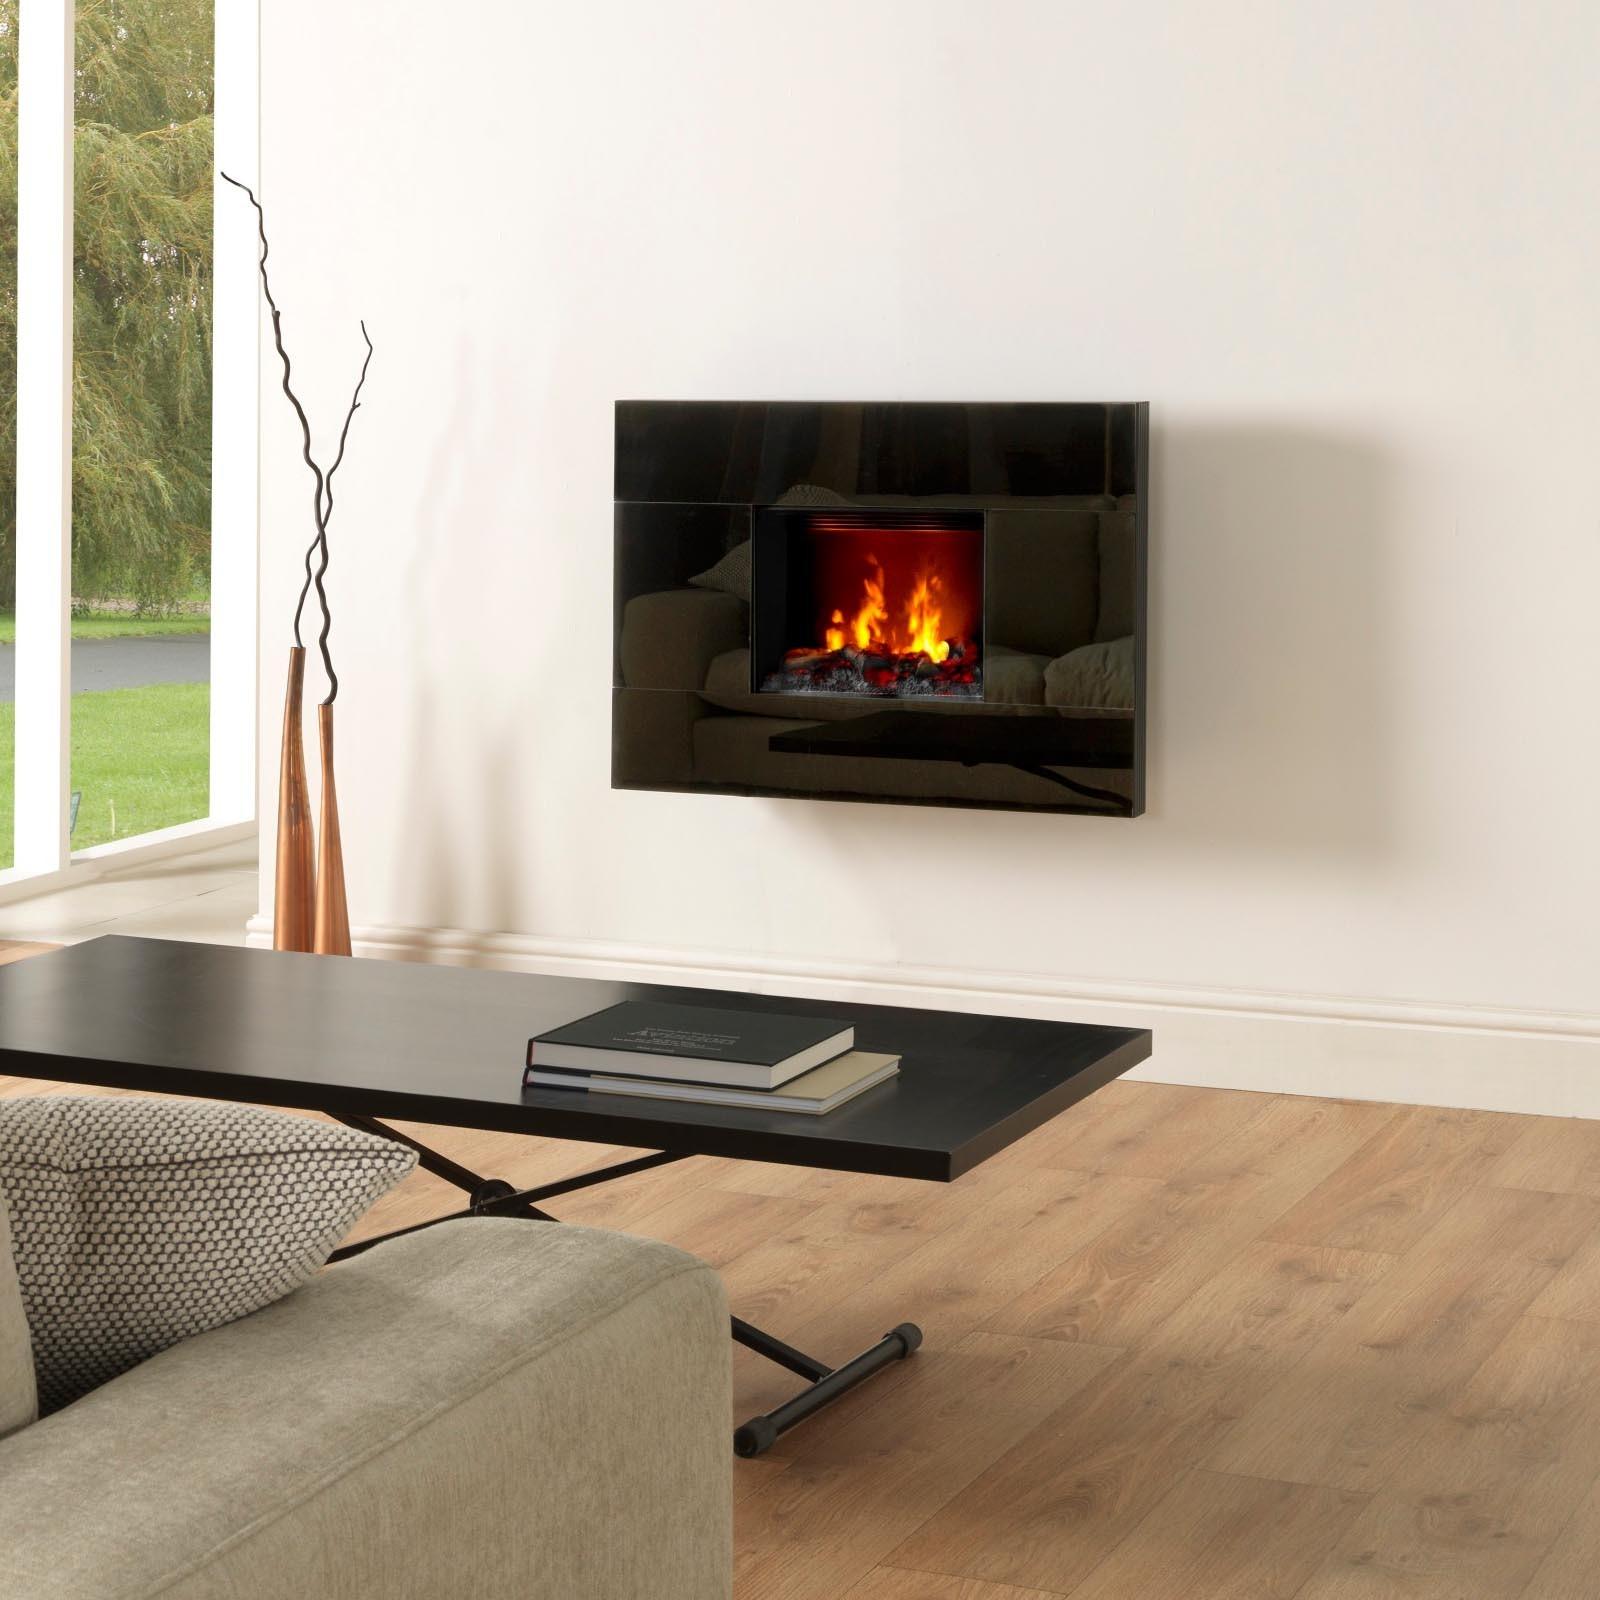 Dimplex envy fireplaces for Dimplex radiatori elettrici